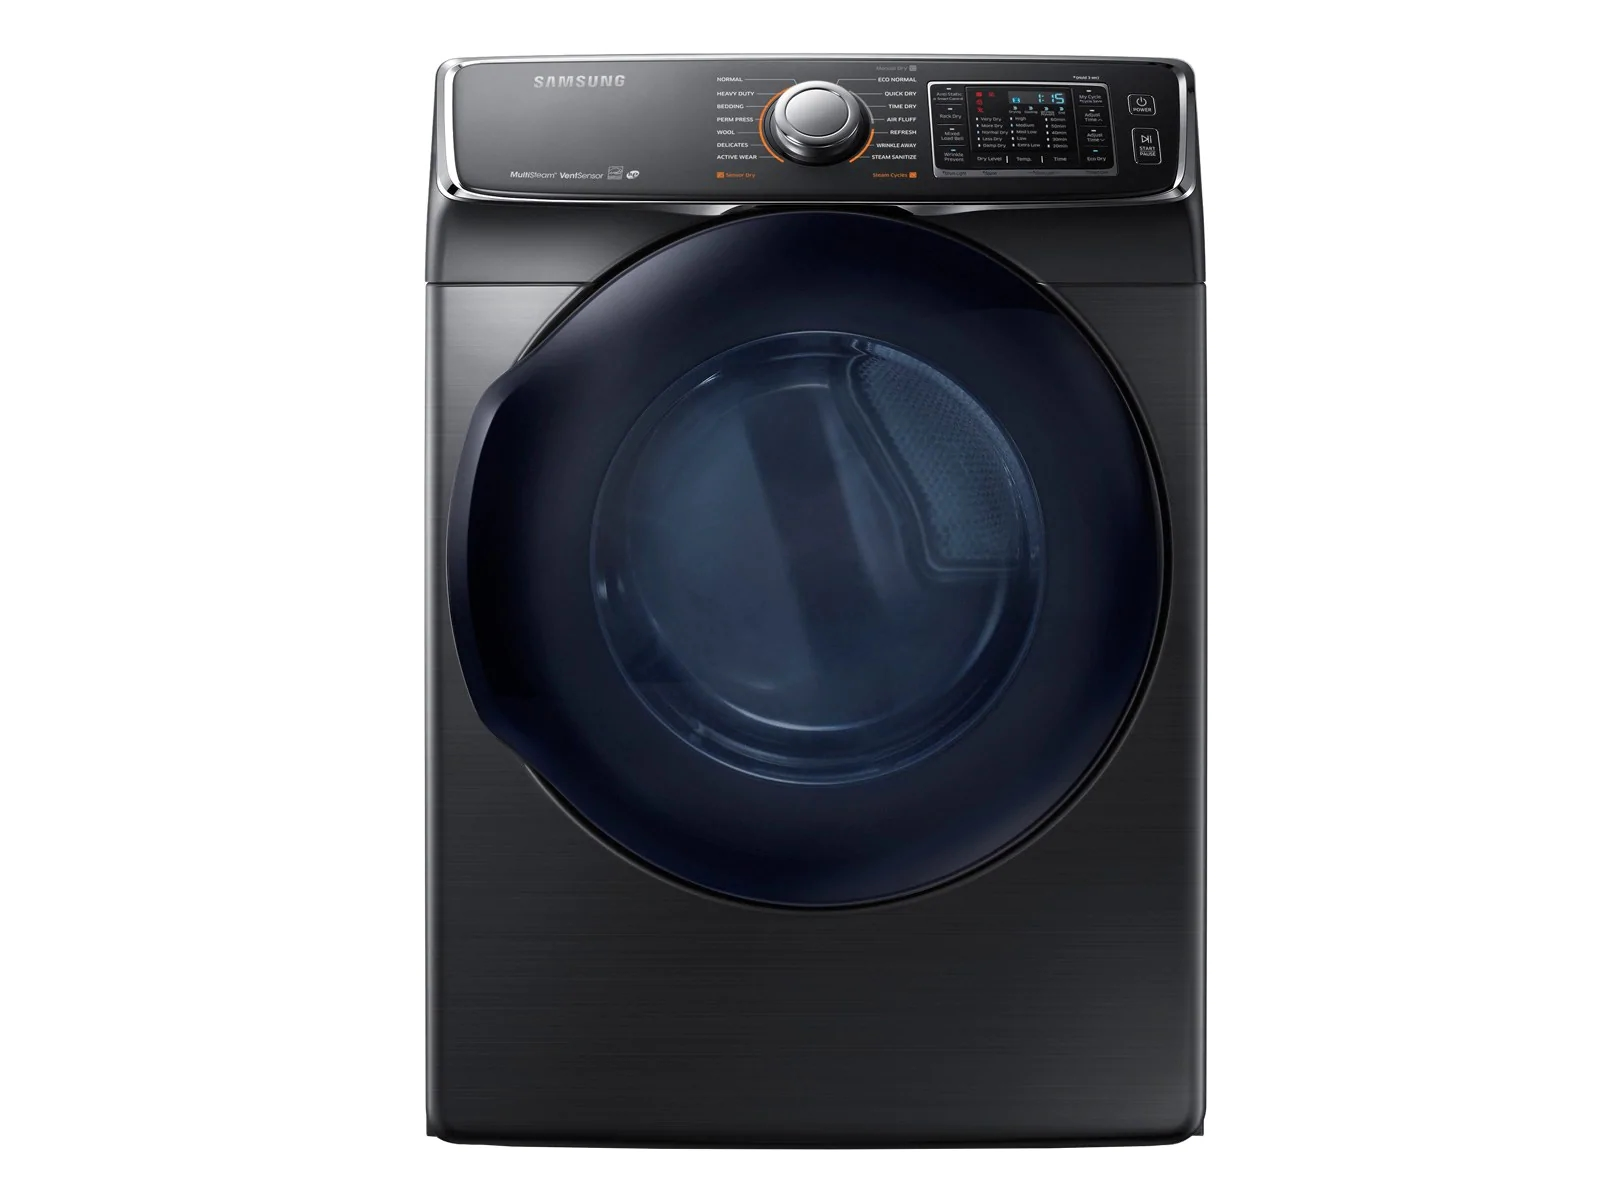 hight resolution of electric dryer dryers dv50k7500ev a3 samsung us